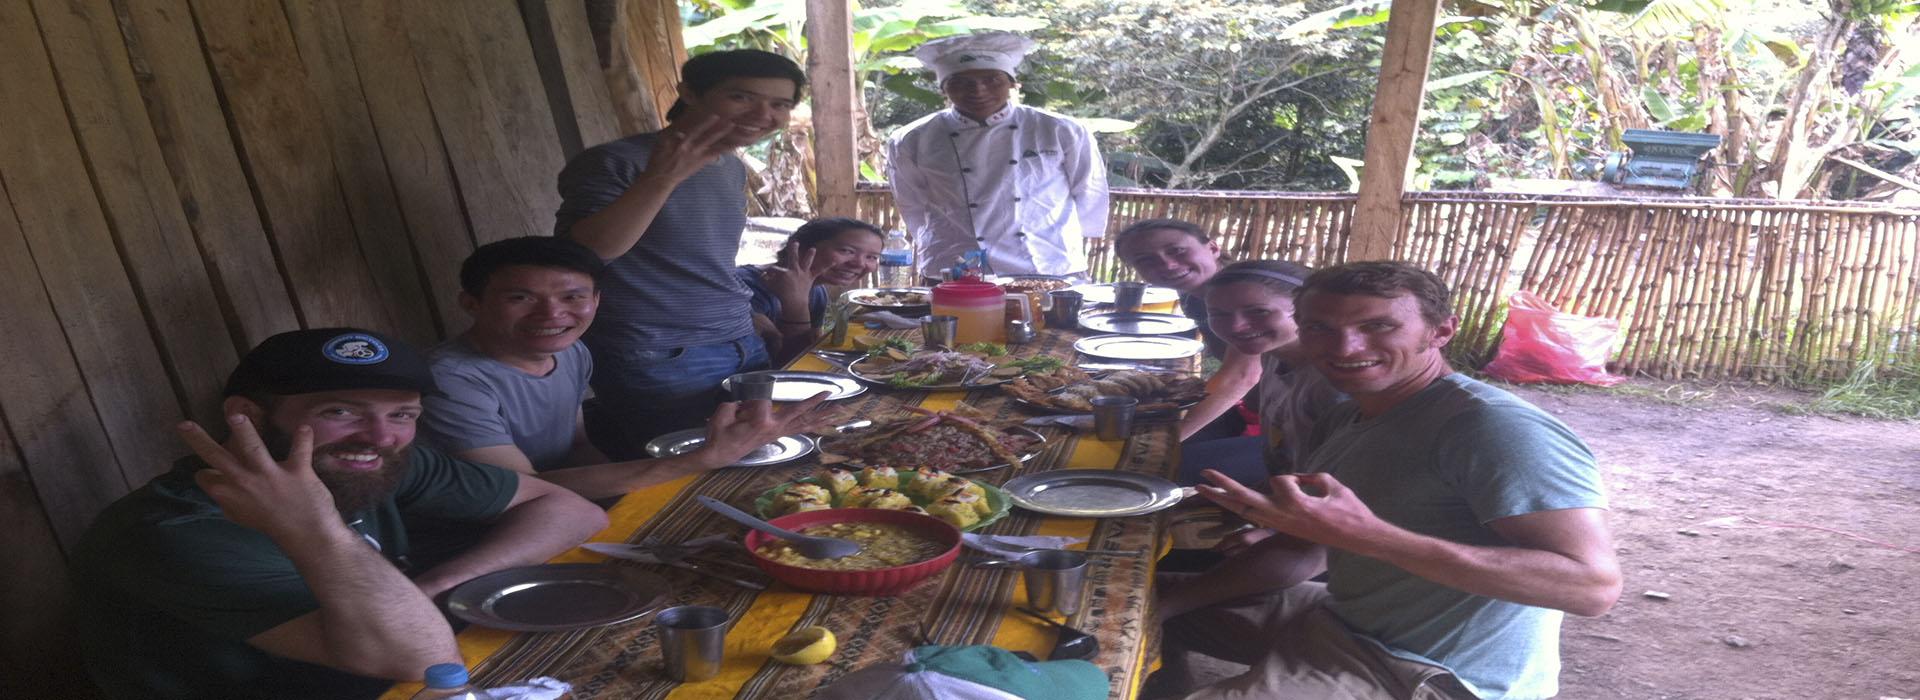 Salkantay Trek to Machu Picchu 4 days return by bus last day